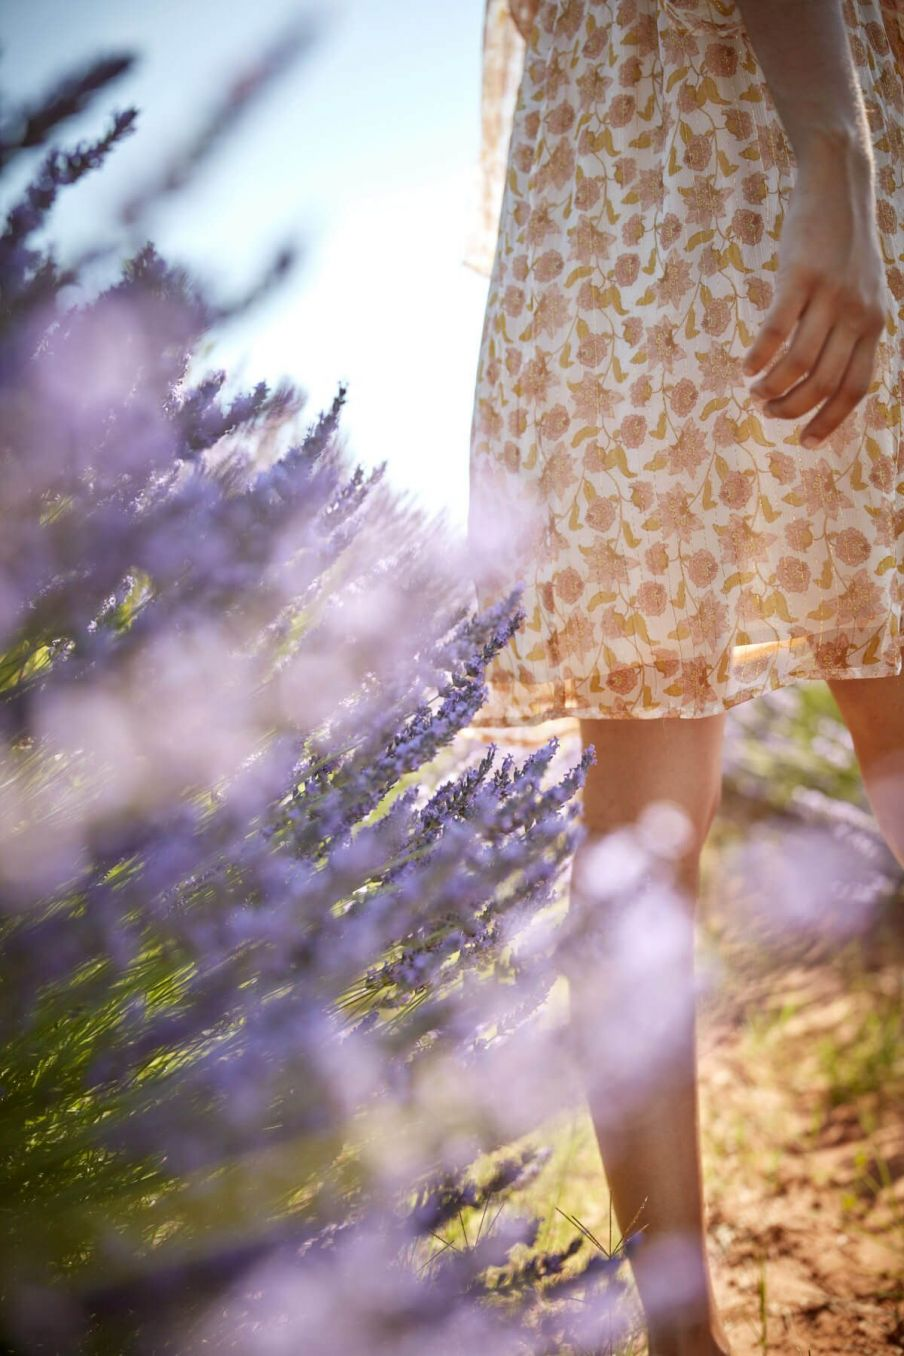 boheme chic vintage robe femme otti blush flowers lurex